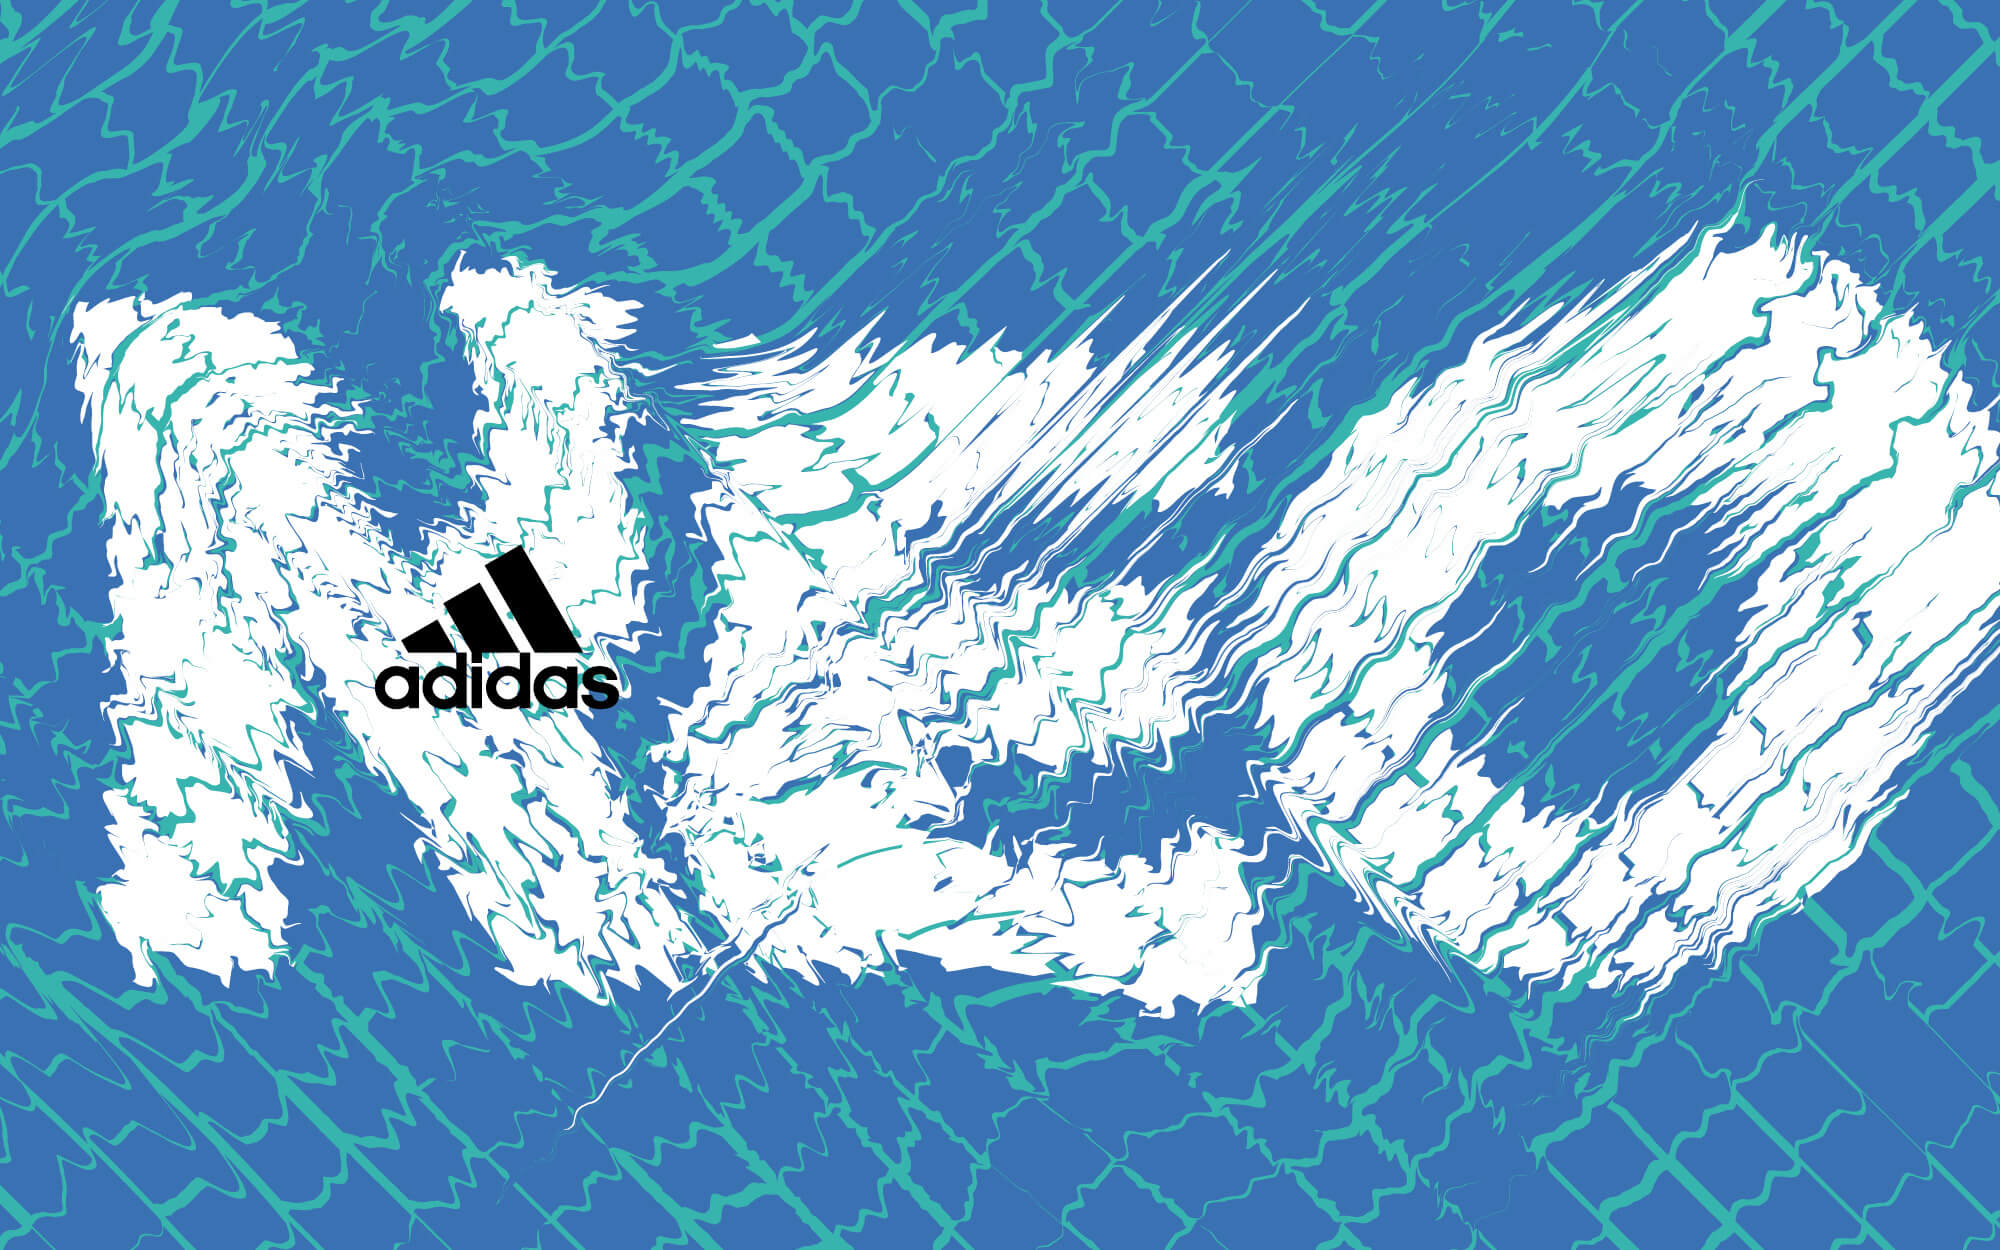 EIGA_adidas_TypeExploration_L_24